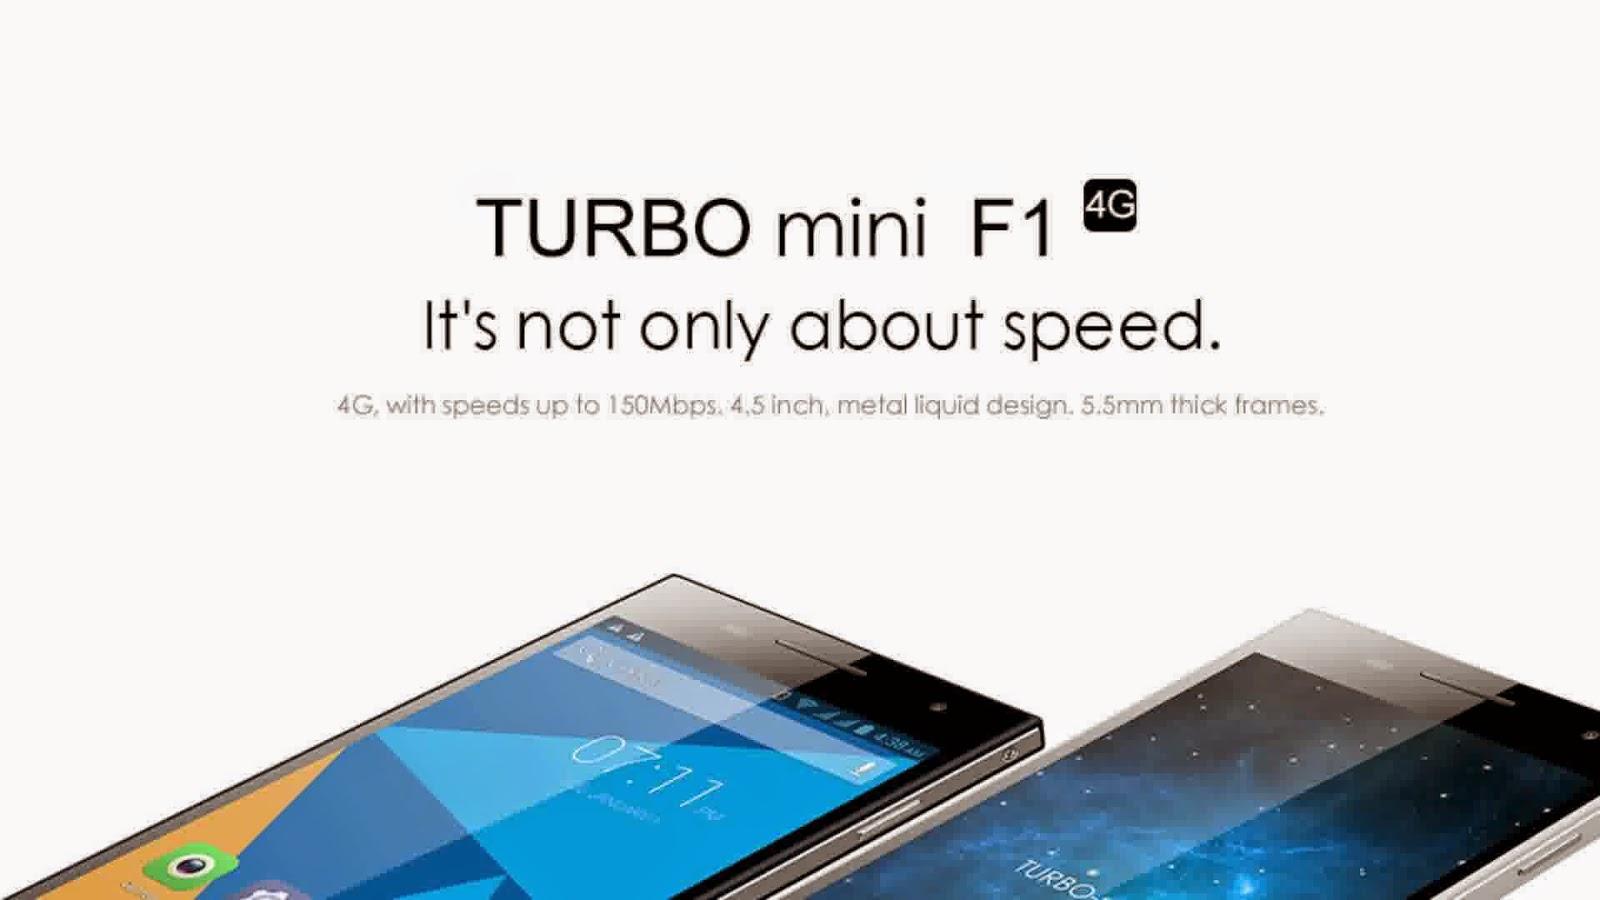 Doogee Turbo Mini F1, Spesifikasi HP Prosesor Quad Core 64-bit Harga Murah